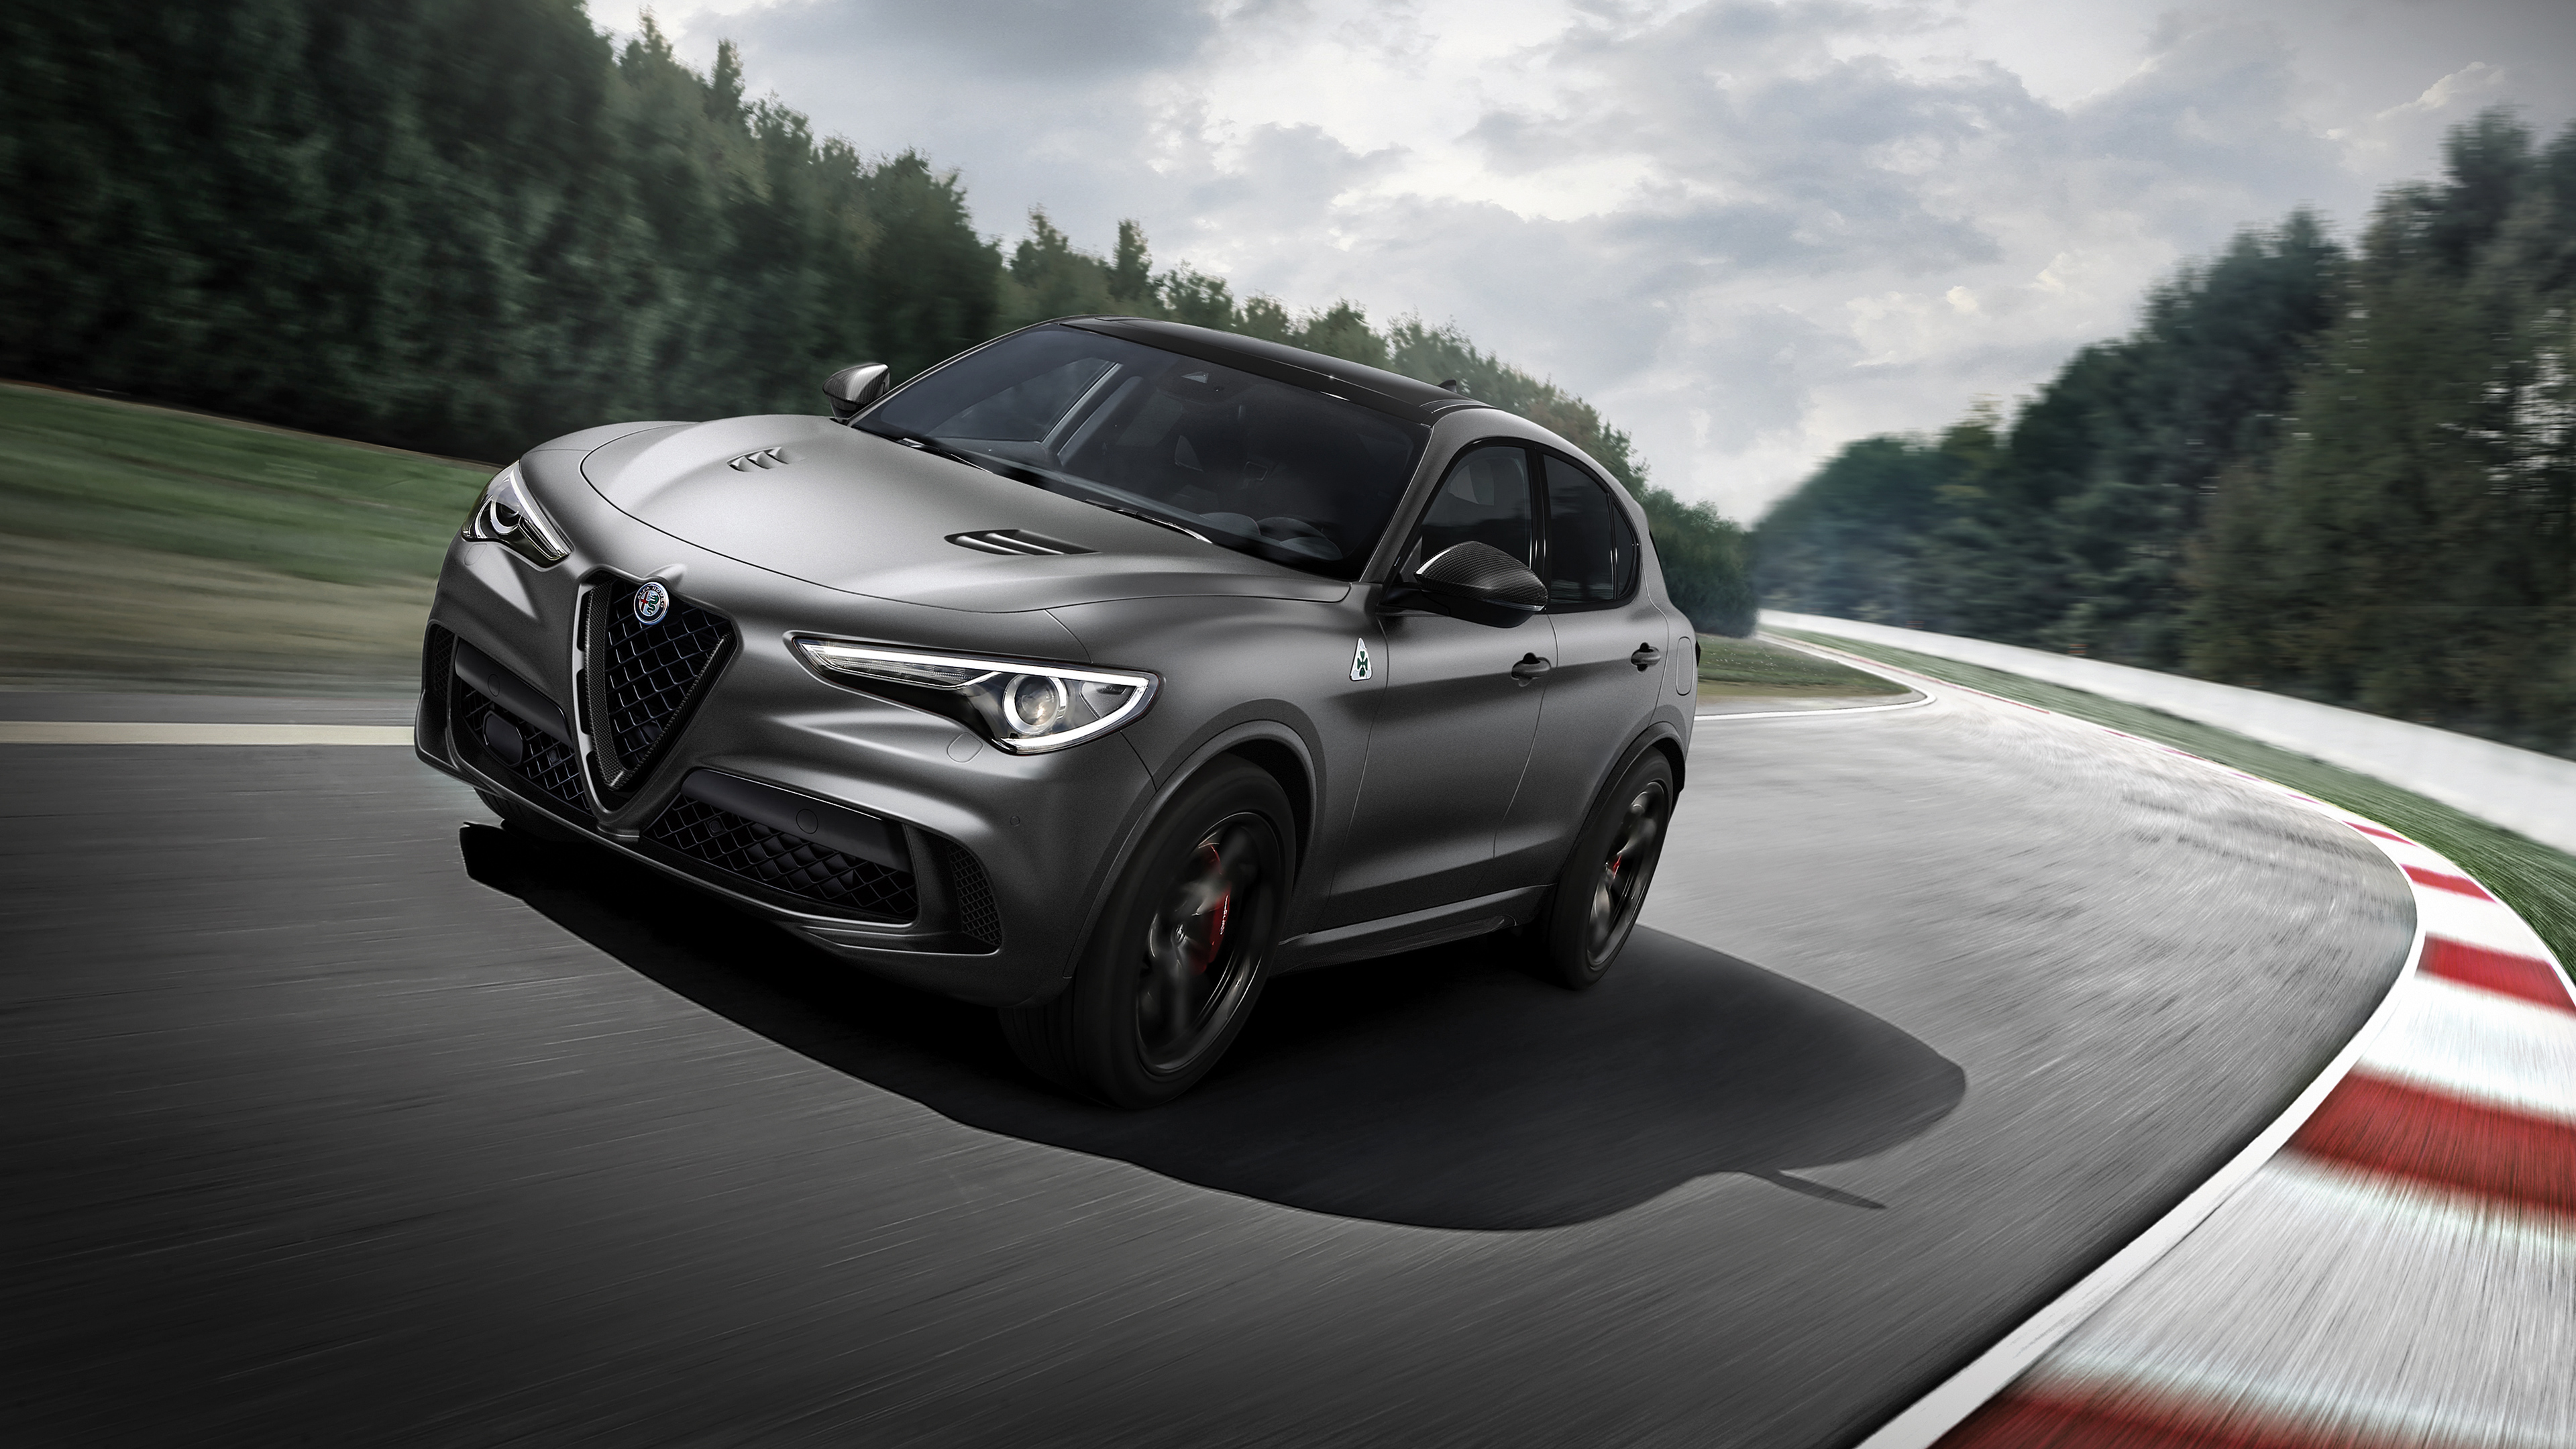 2018 Alfa Romeo Stelvio Quadrifoglio 4k Wallpaper Hd Car